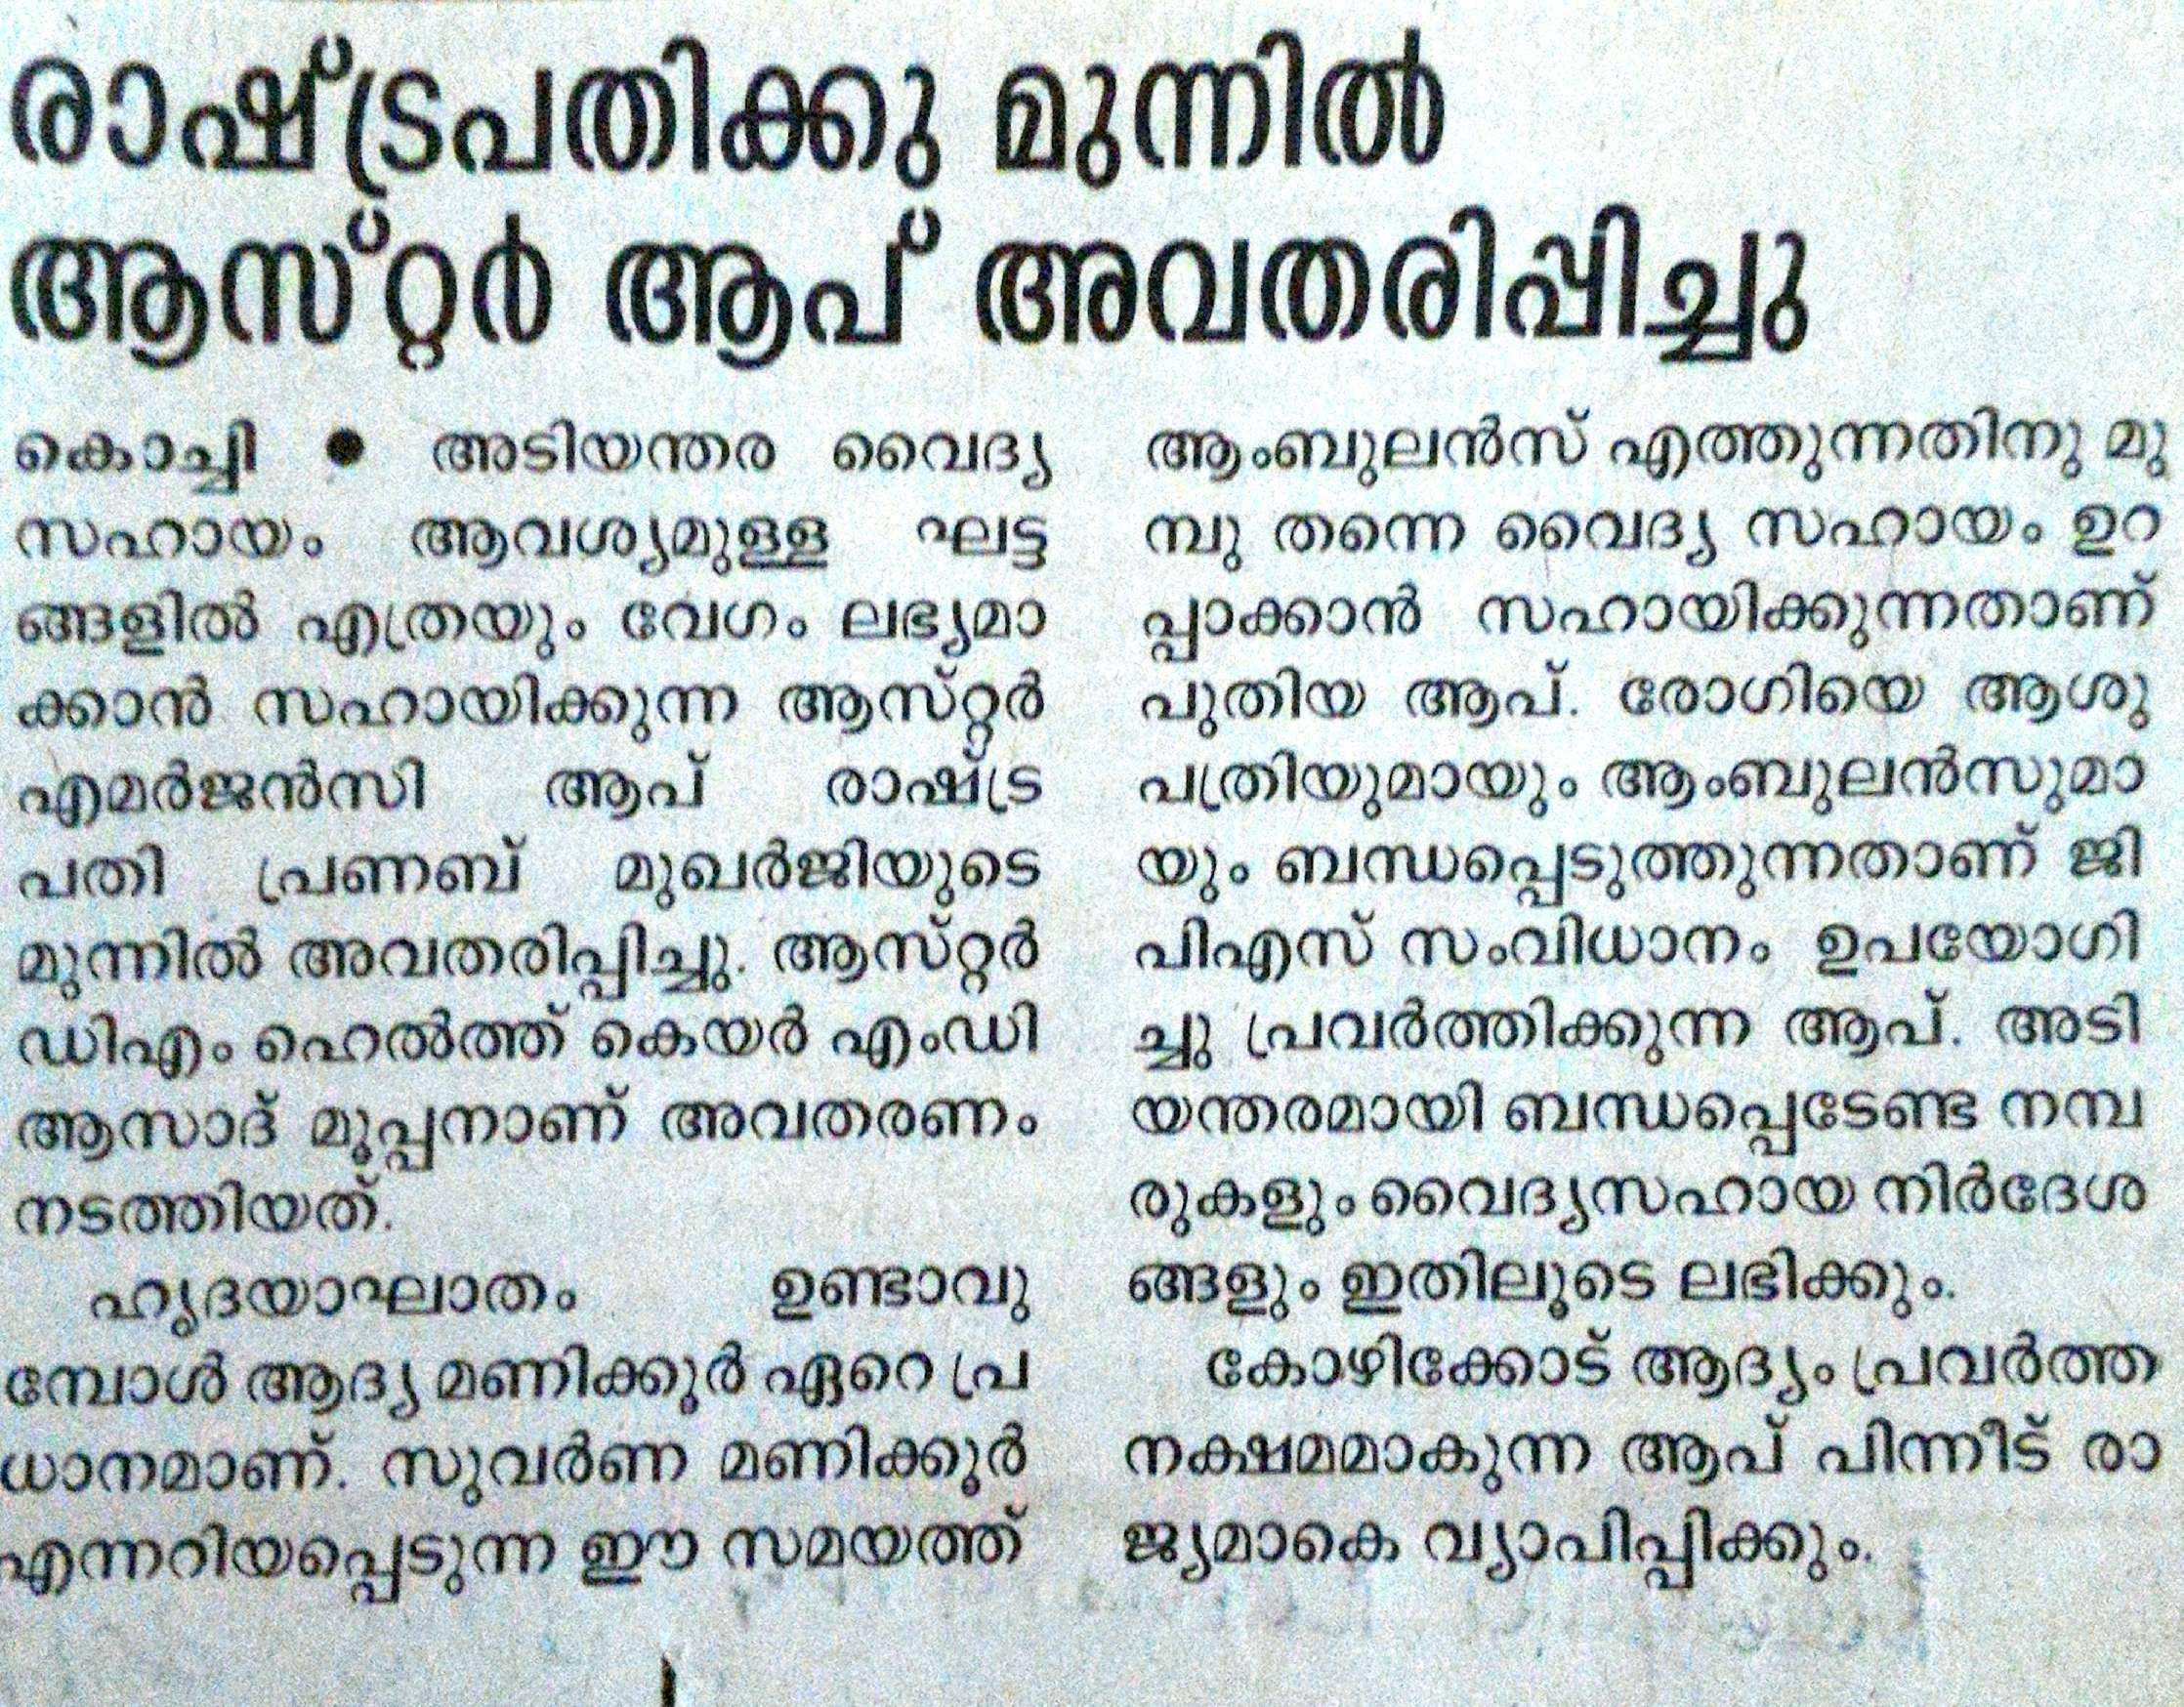 Malayalamanorama_30.5.17_pg_15